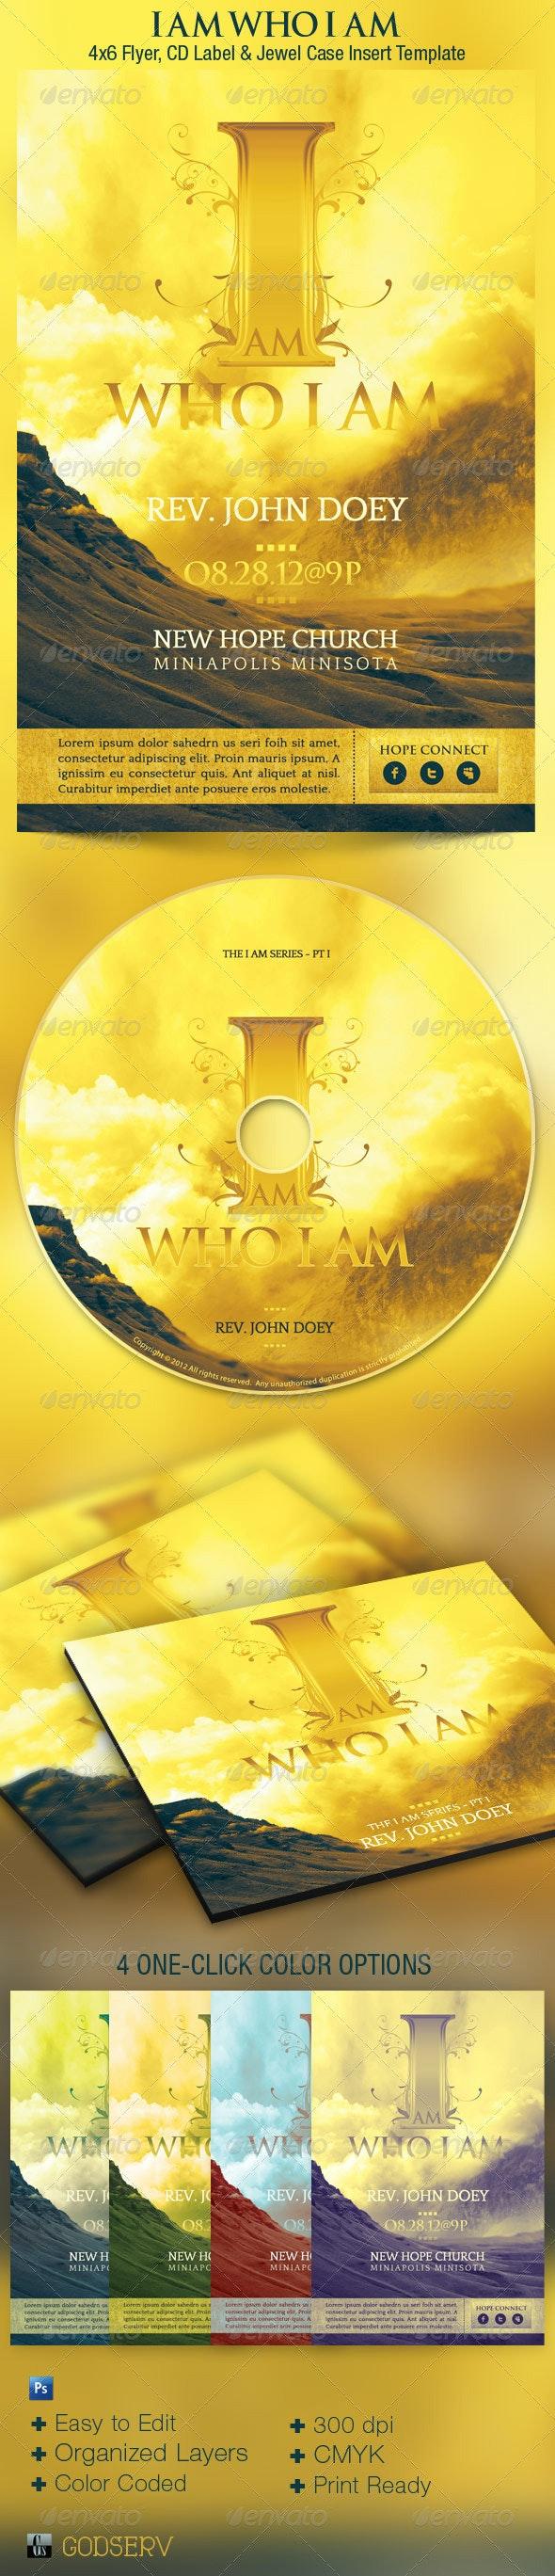 I Am Who I Am Church Flyer CD Template - Church Flyers